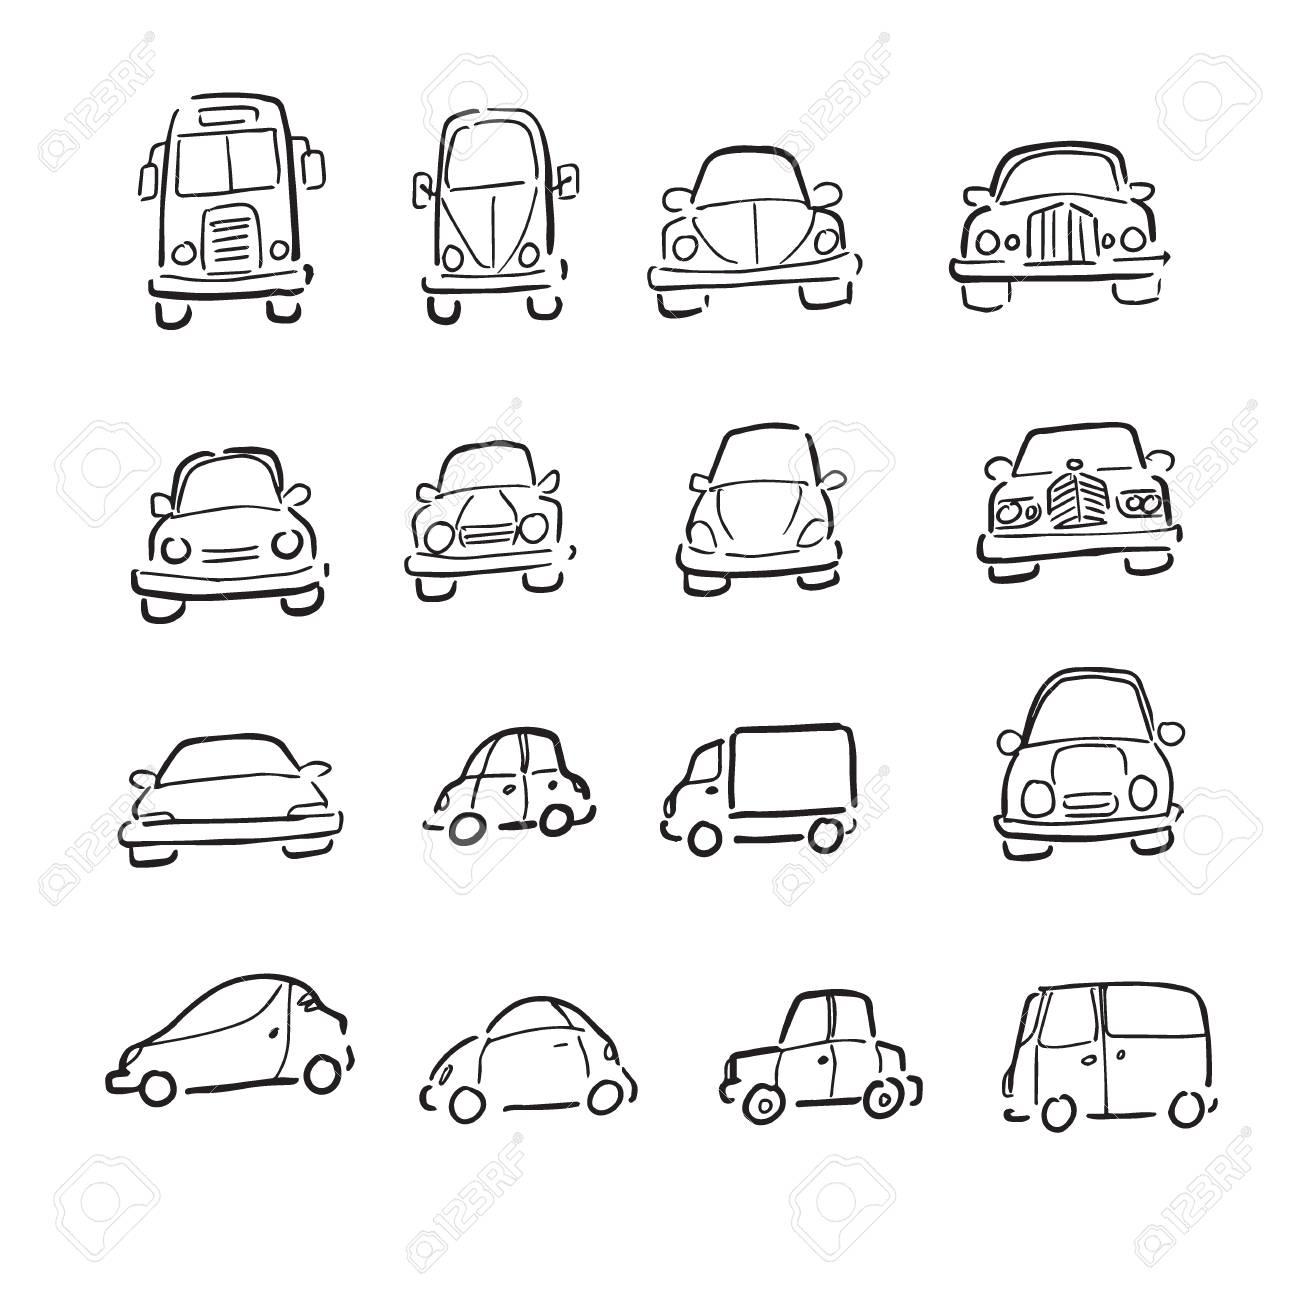 6889e16cd852a1 Cars trucks and vans cartoon drawing Stock Vector - 65998436